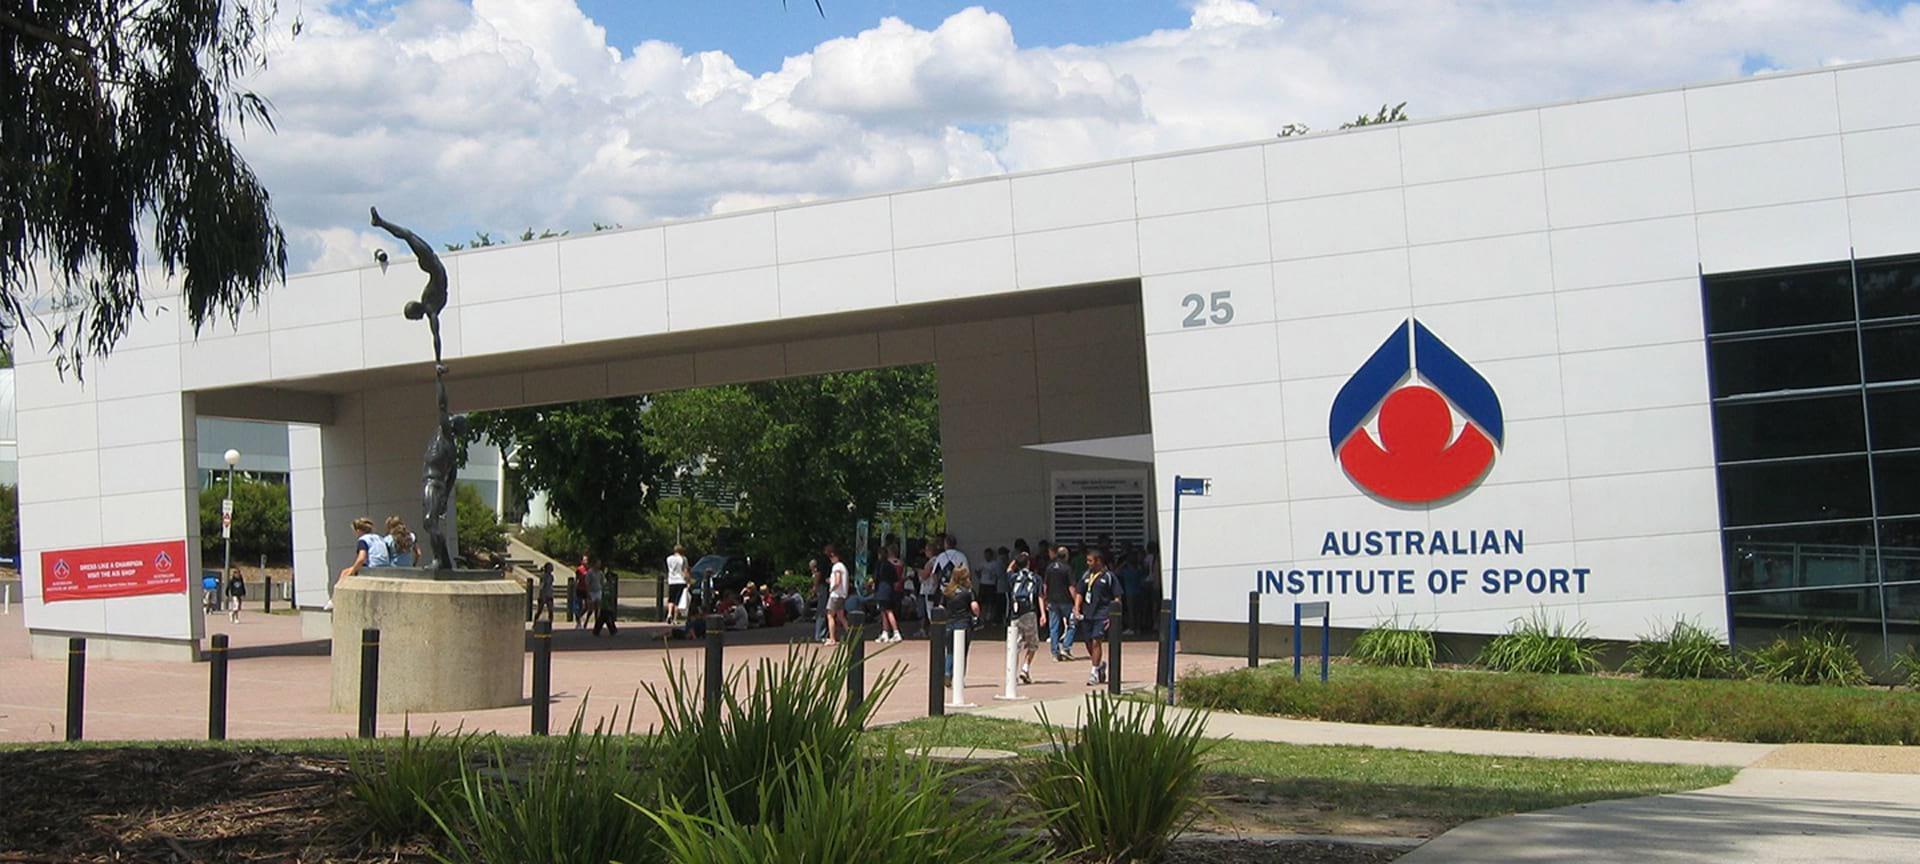 Australian Institute of Sport, Canberra, Australia